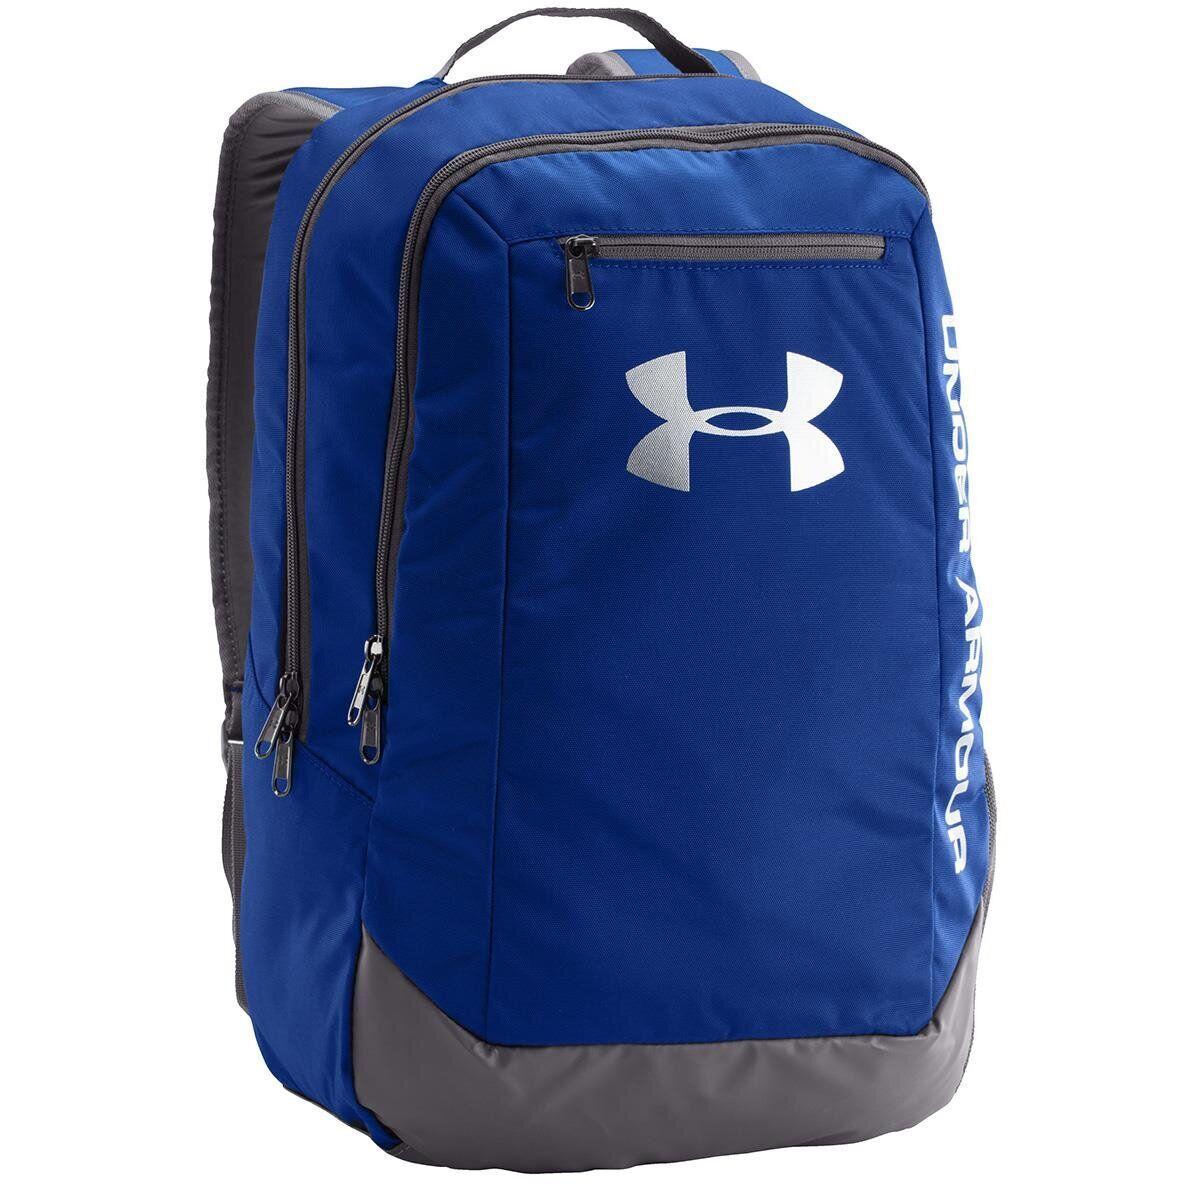 Рюкзак спортивный Under Armour Hustle Backpack 27л LDWR UNI blue (1273274-400)